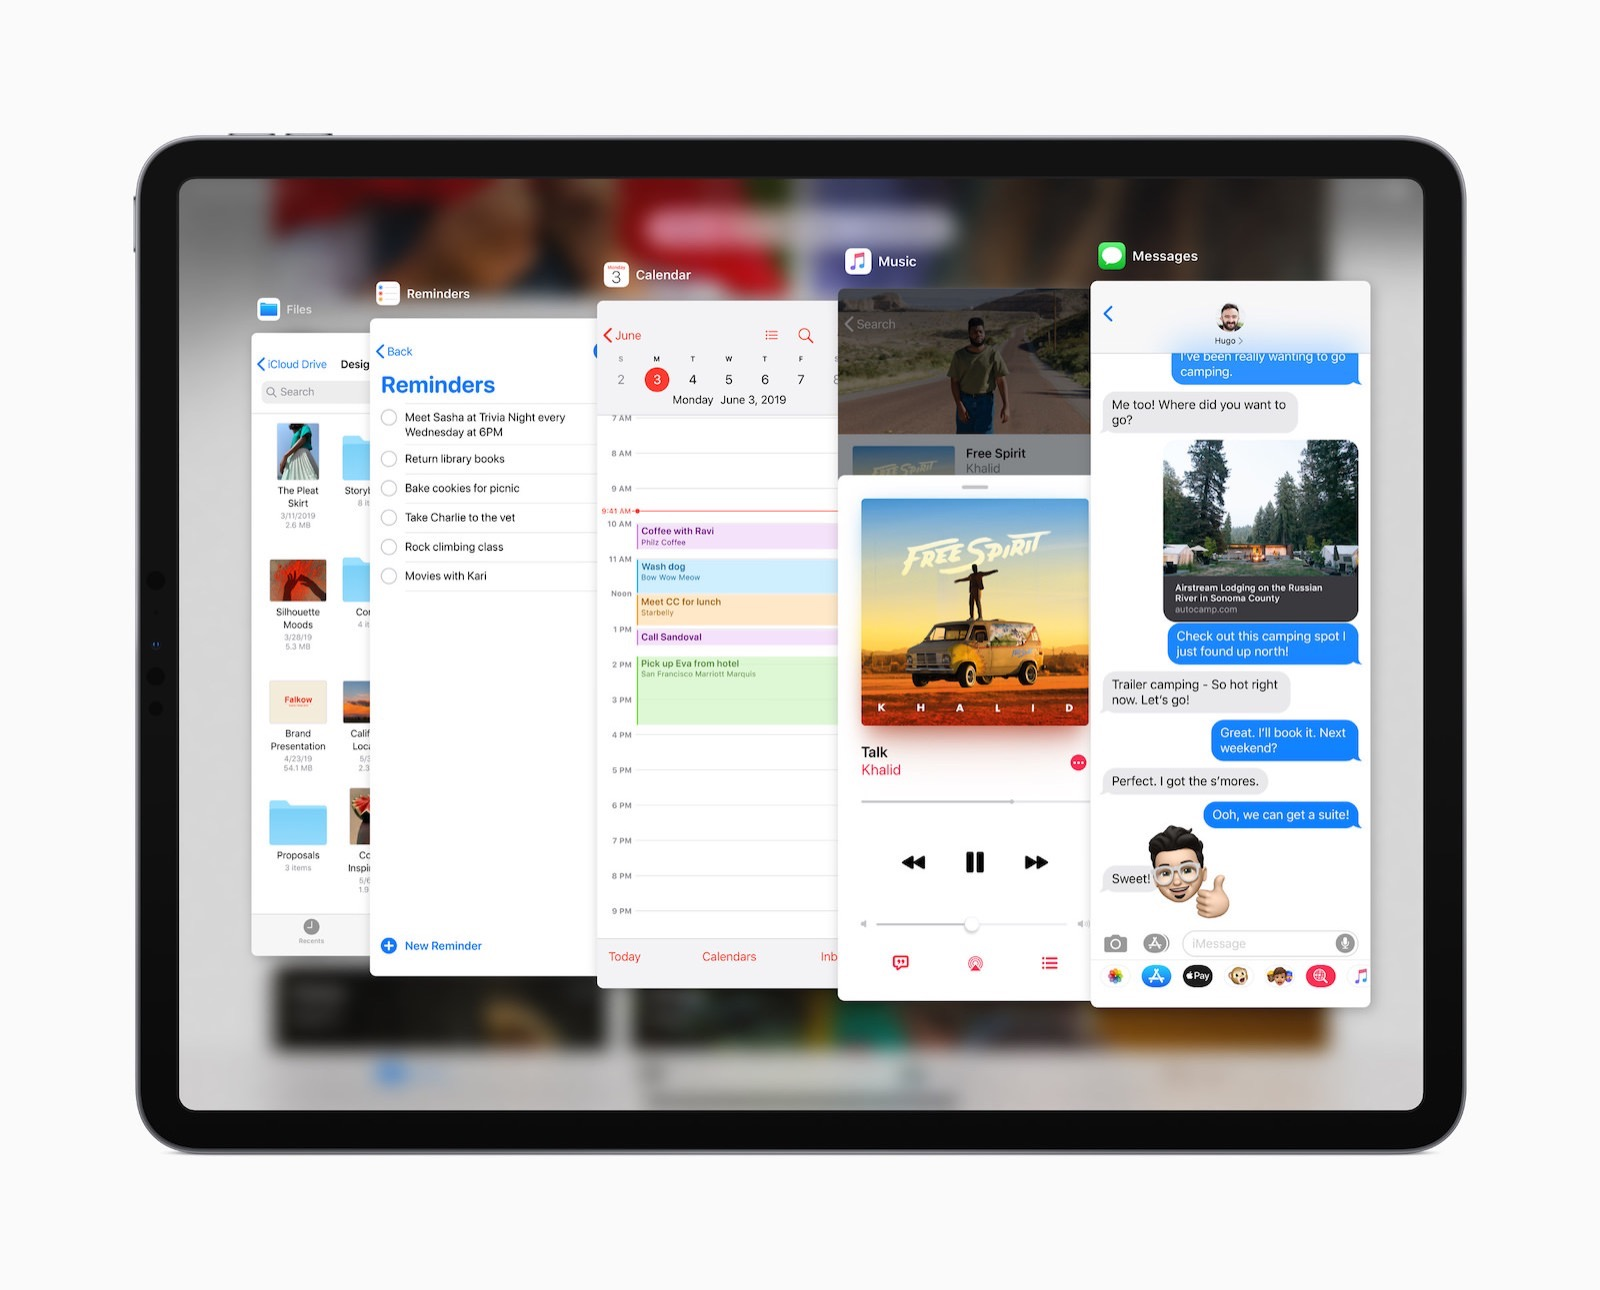 Apple_iPadOS_Slide-Over_060319.jpg